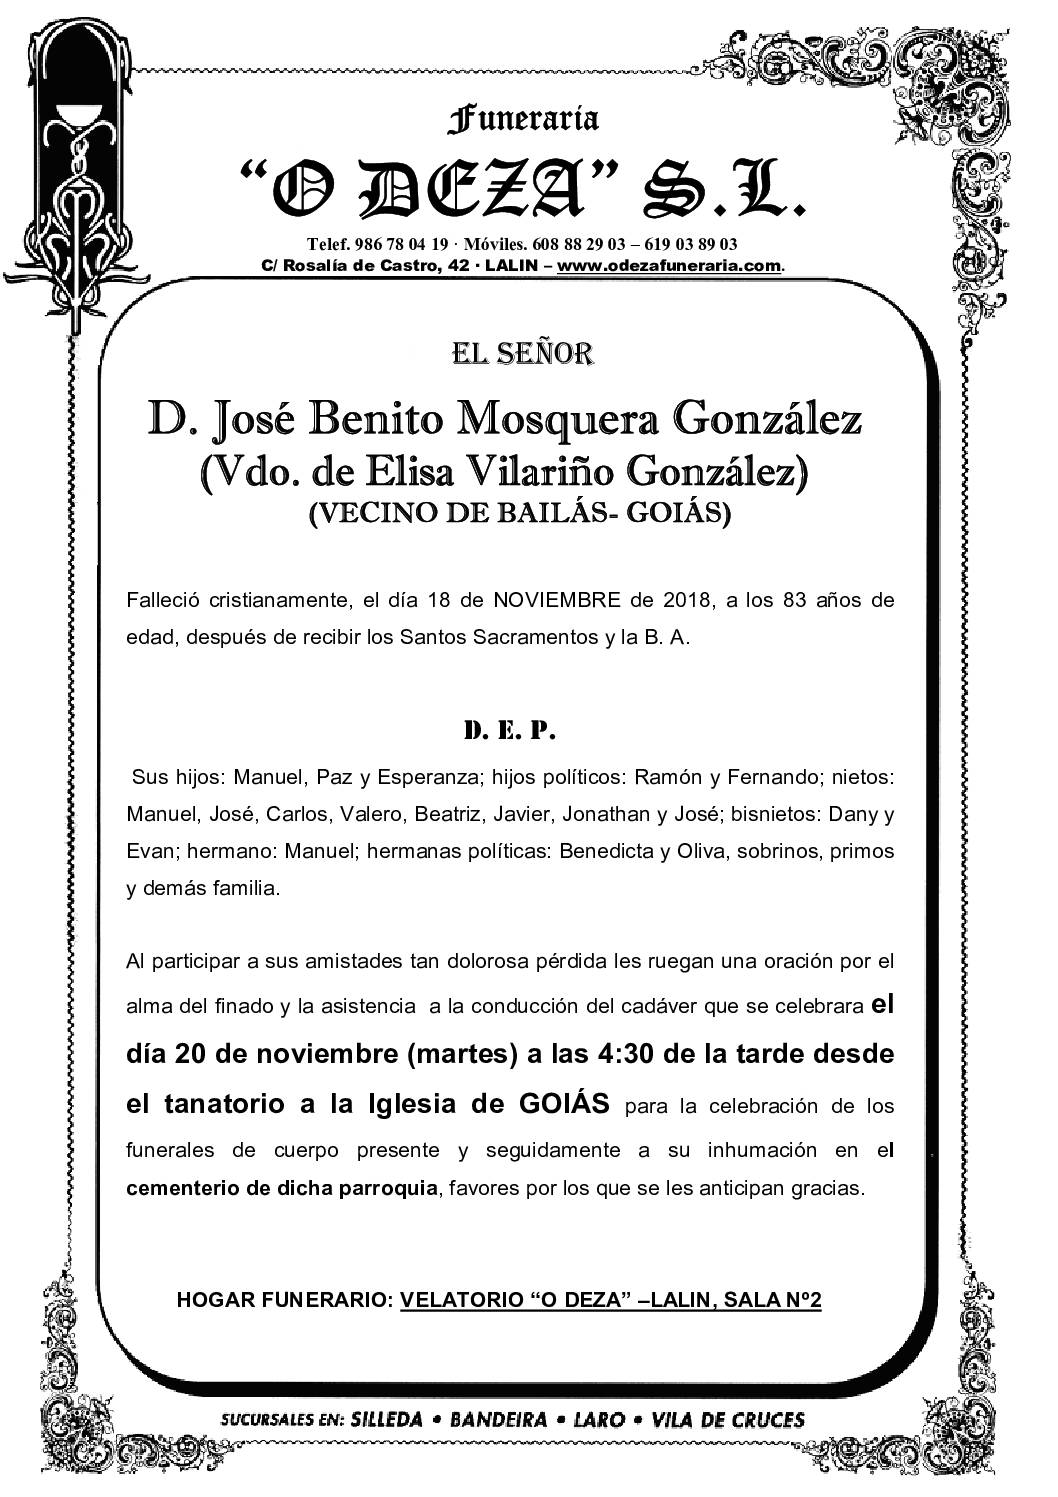 D. JOSÉ BENITO MOSQUERA GONZÁLEZ